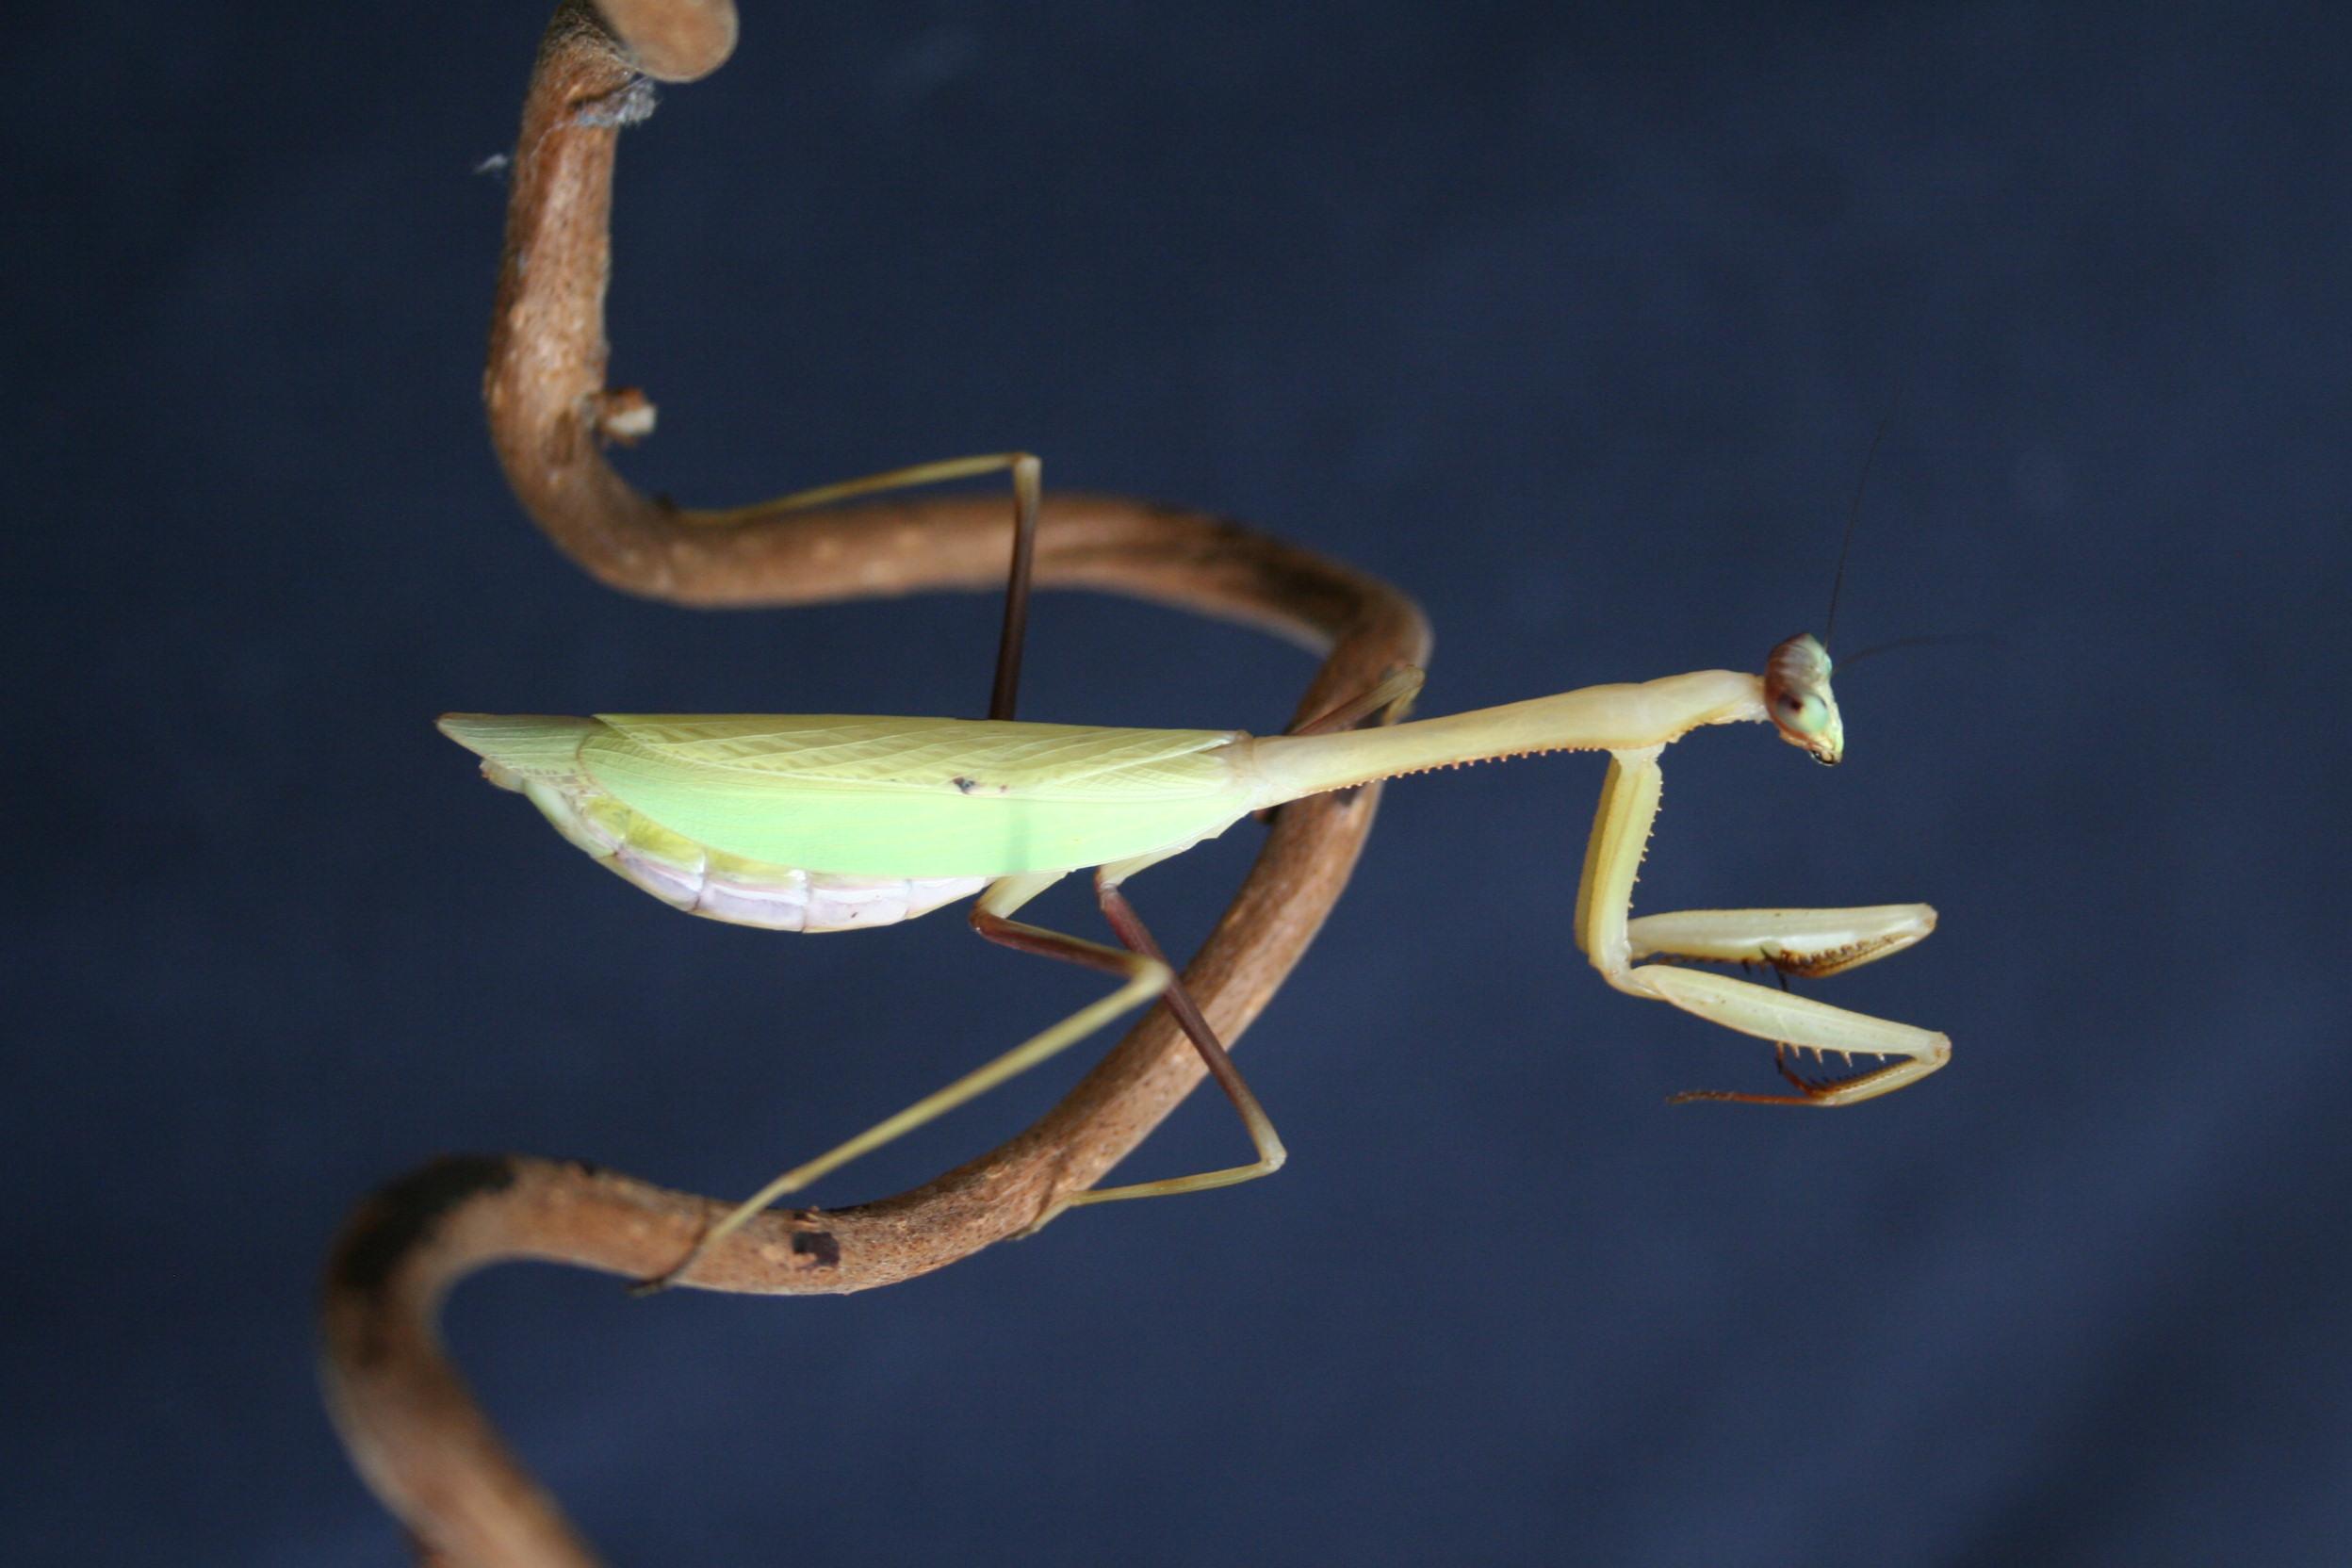 IGM 218, Oxyopsis festae